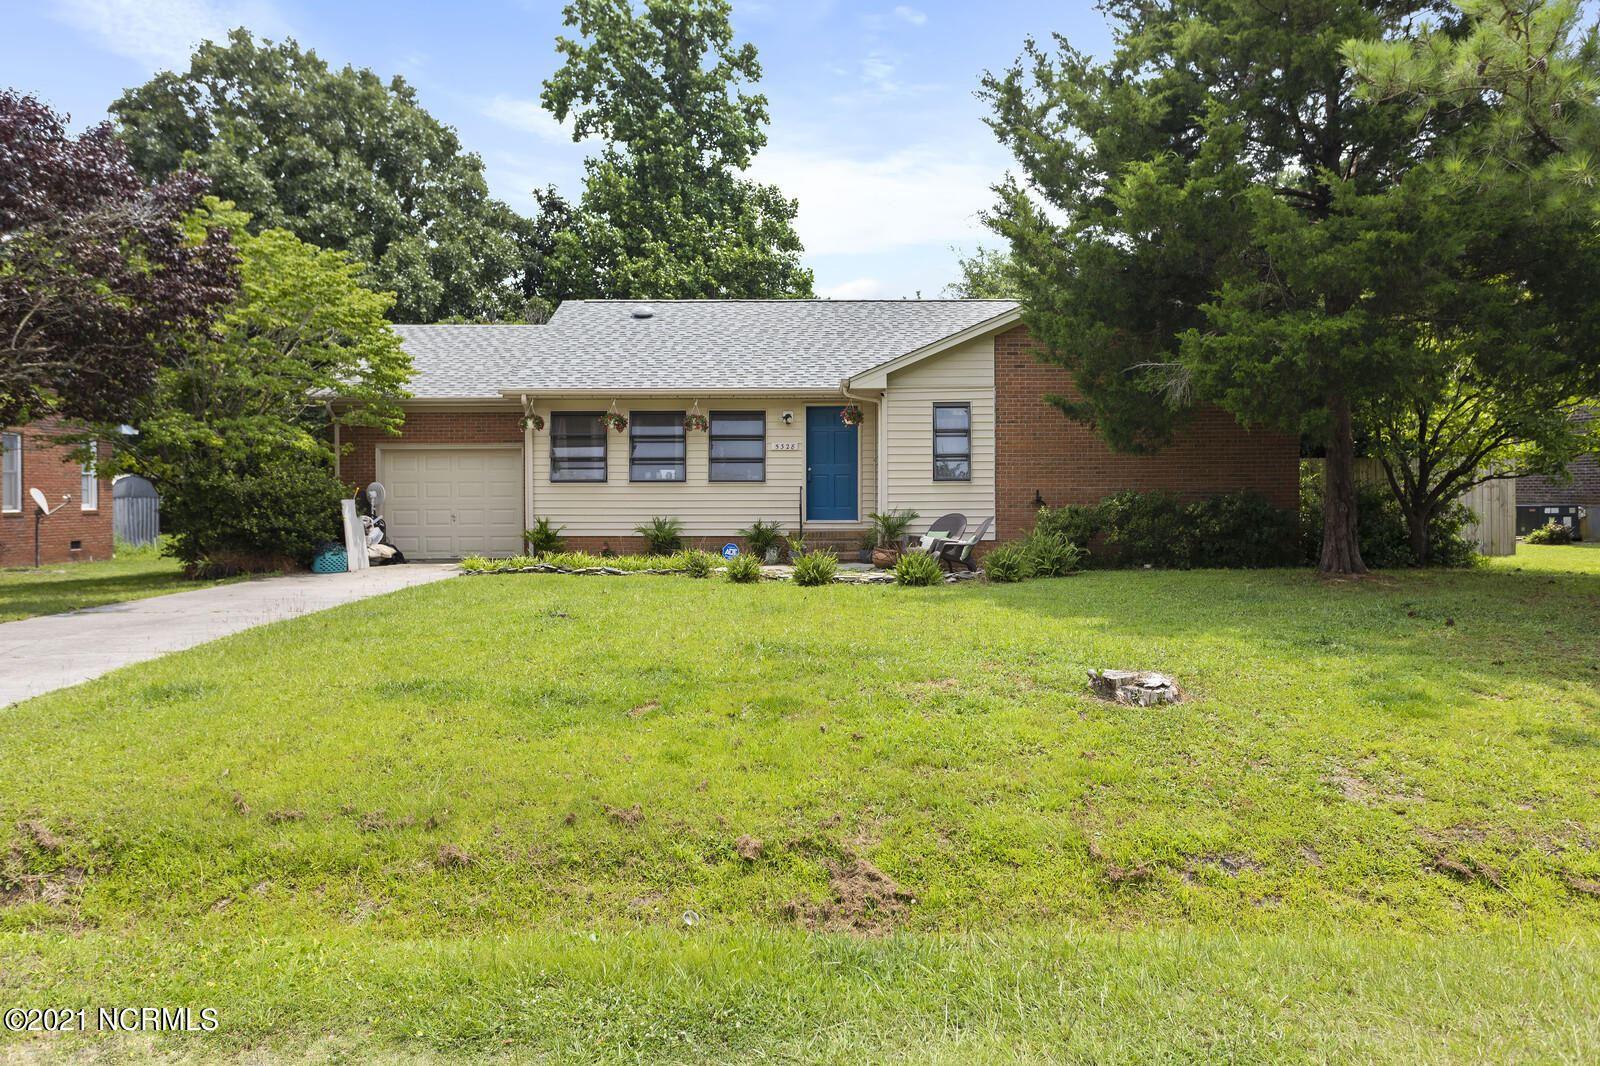 Photo for 5328 Dandelion Drive, Wilmington, NC 28405 (MLS # 100277897)